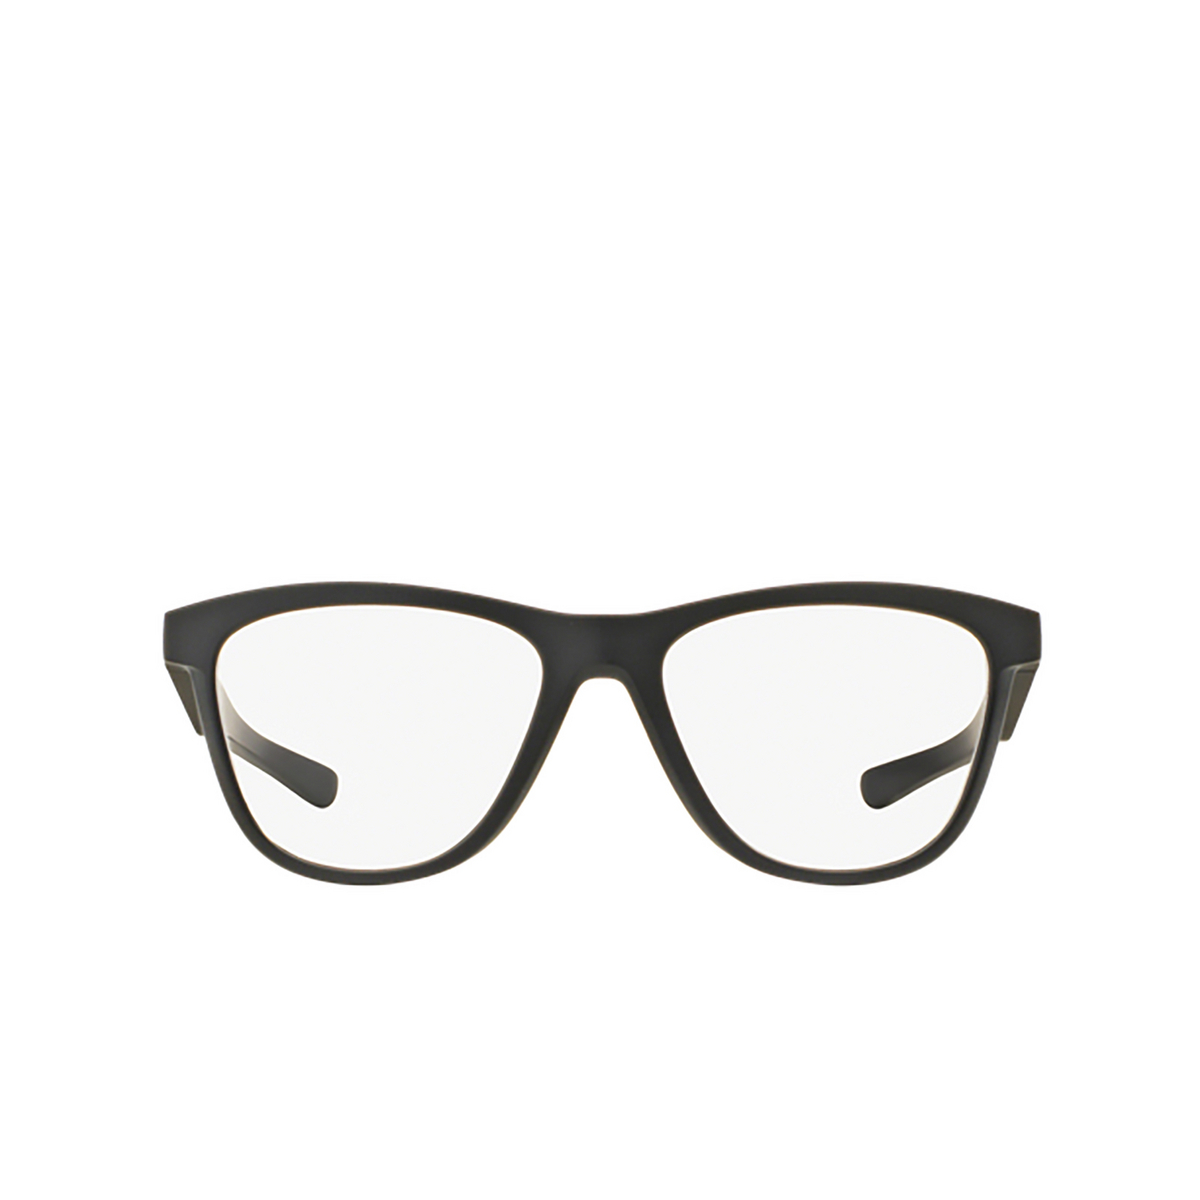 Oakley® Square Eyeglasses: OX8070 color 0653.